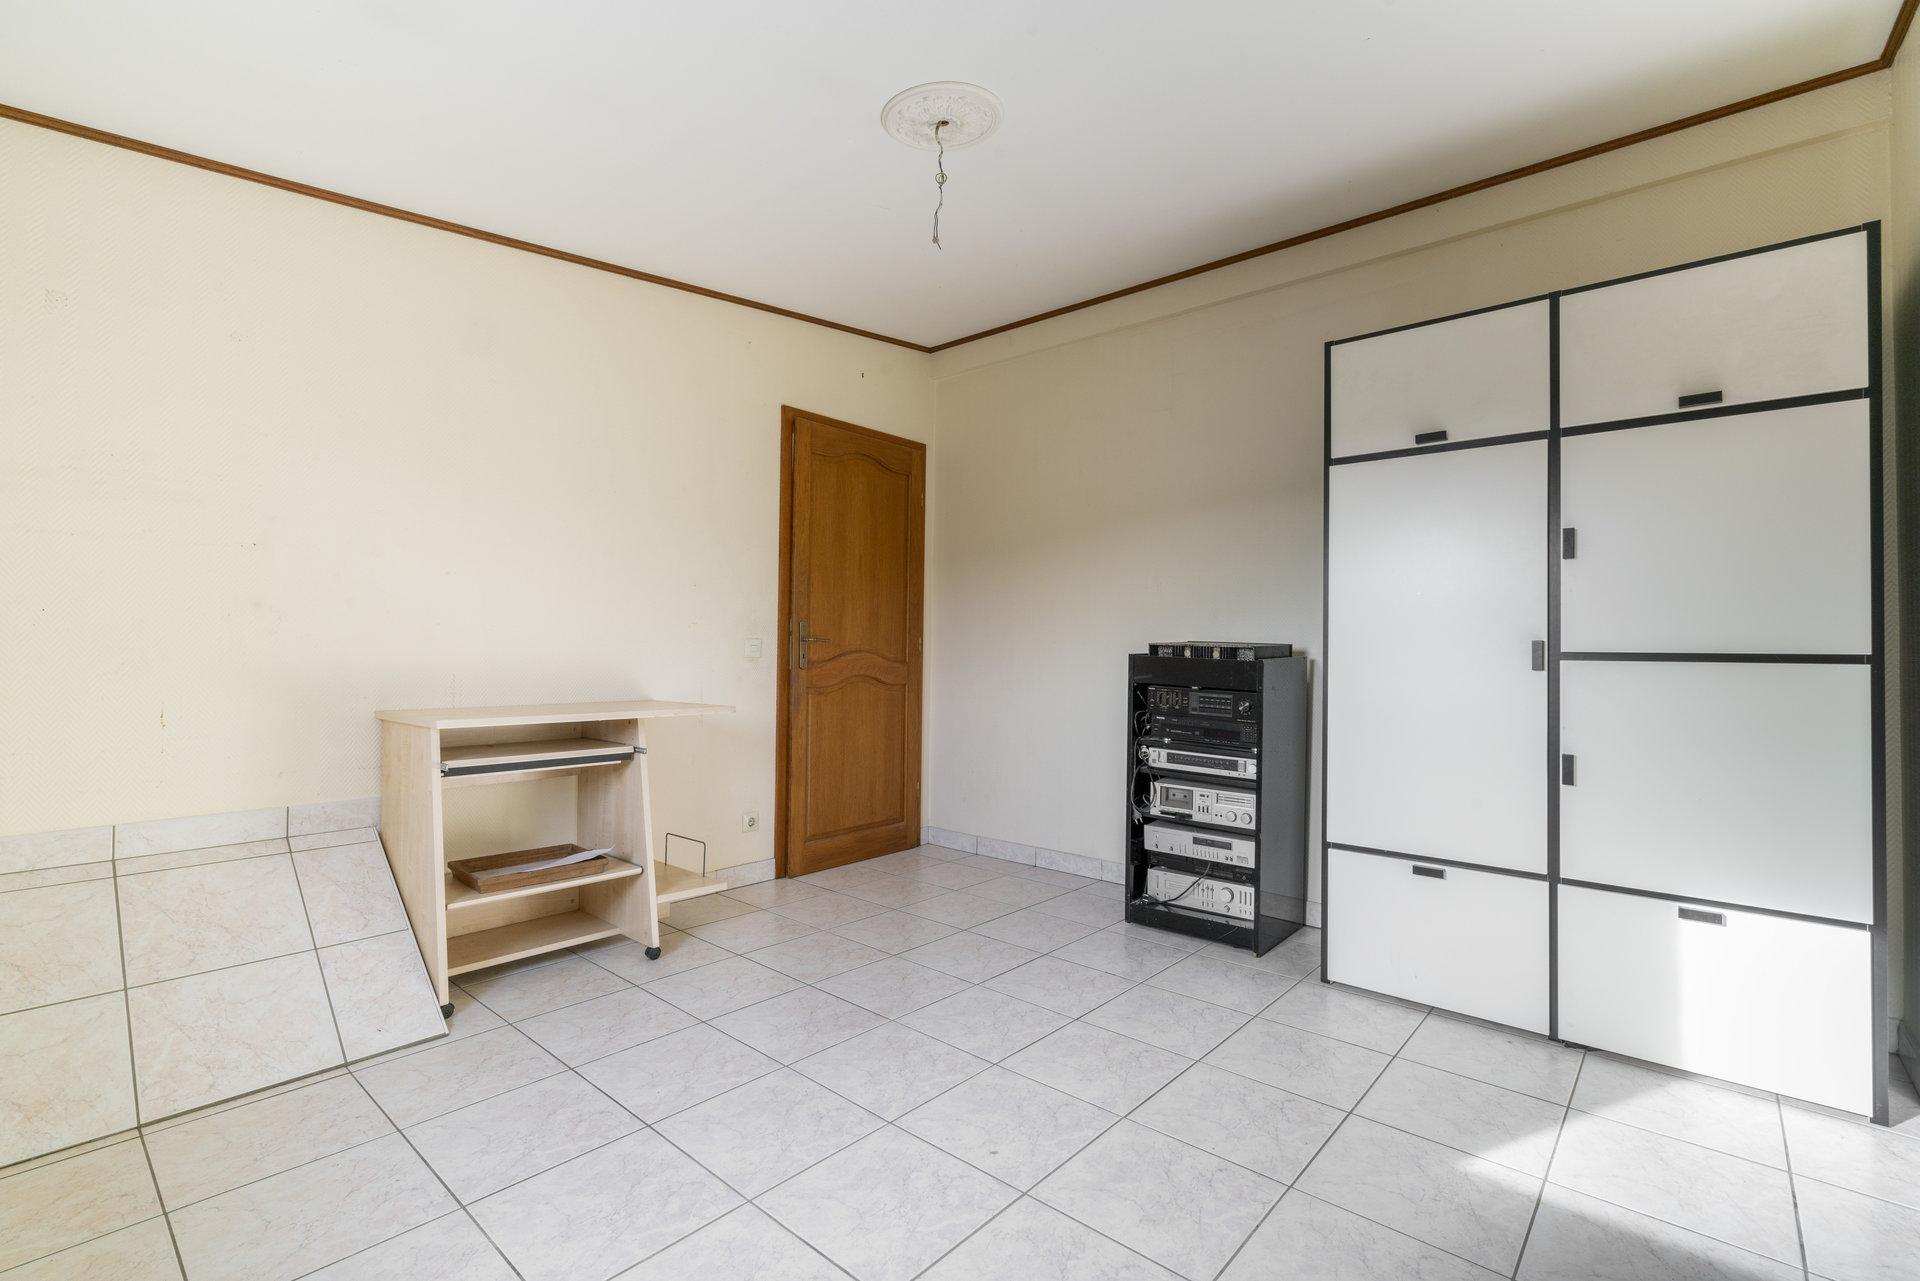 Verkauf Haus - Dudelange - Luxemburg